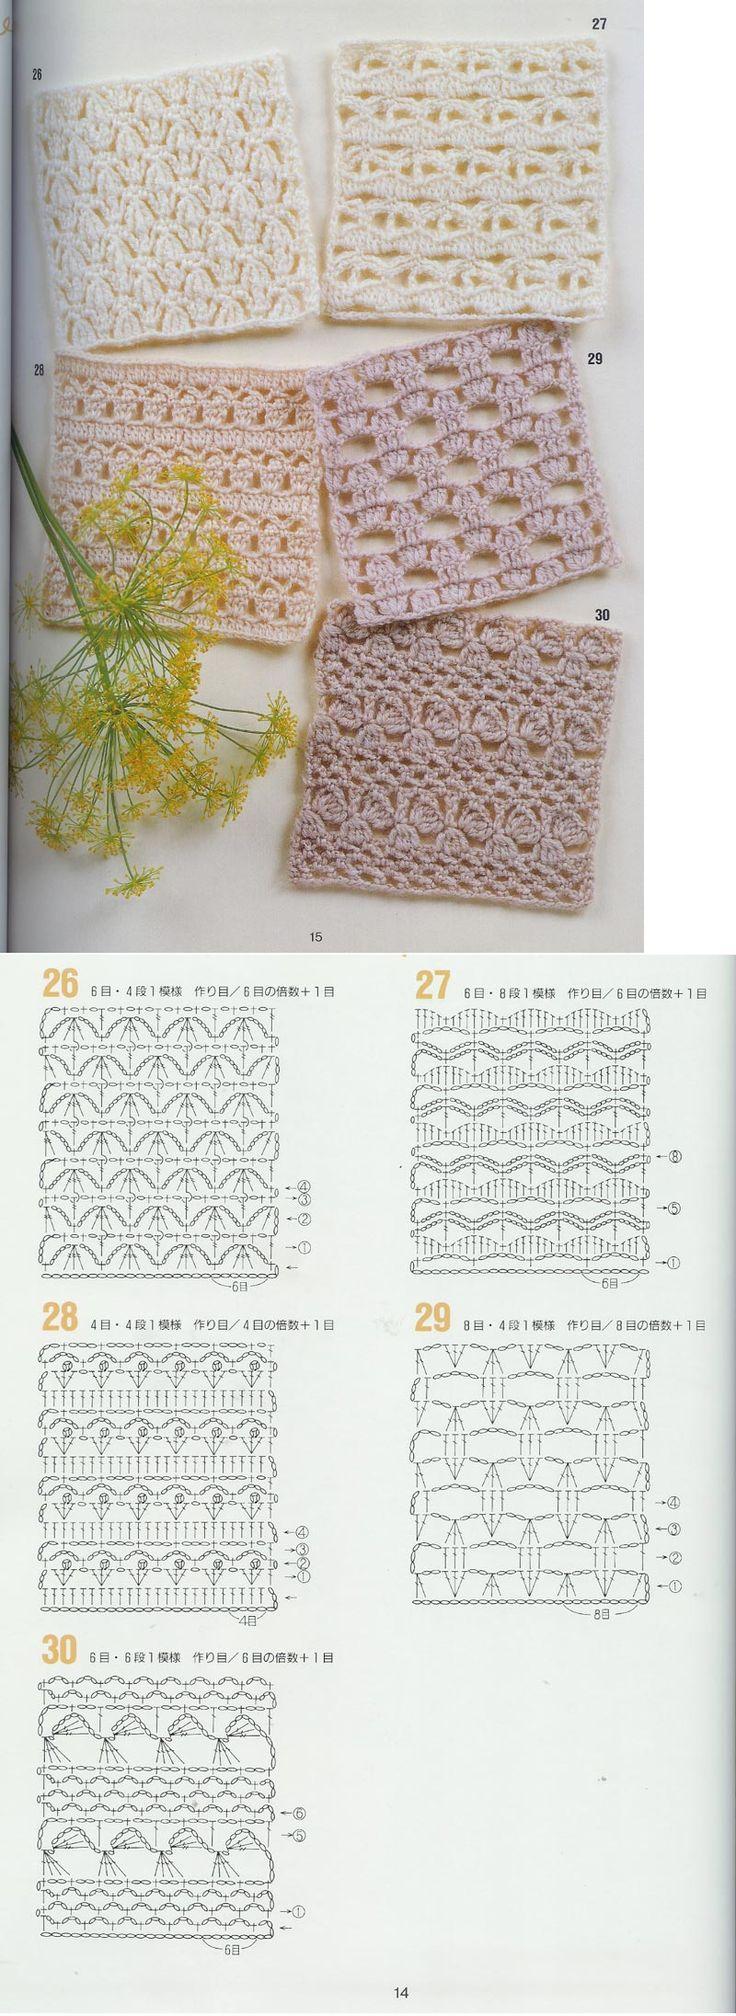 crochet stitches 2                                                                                                                                                                                 More